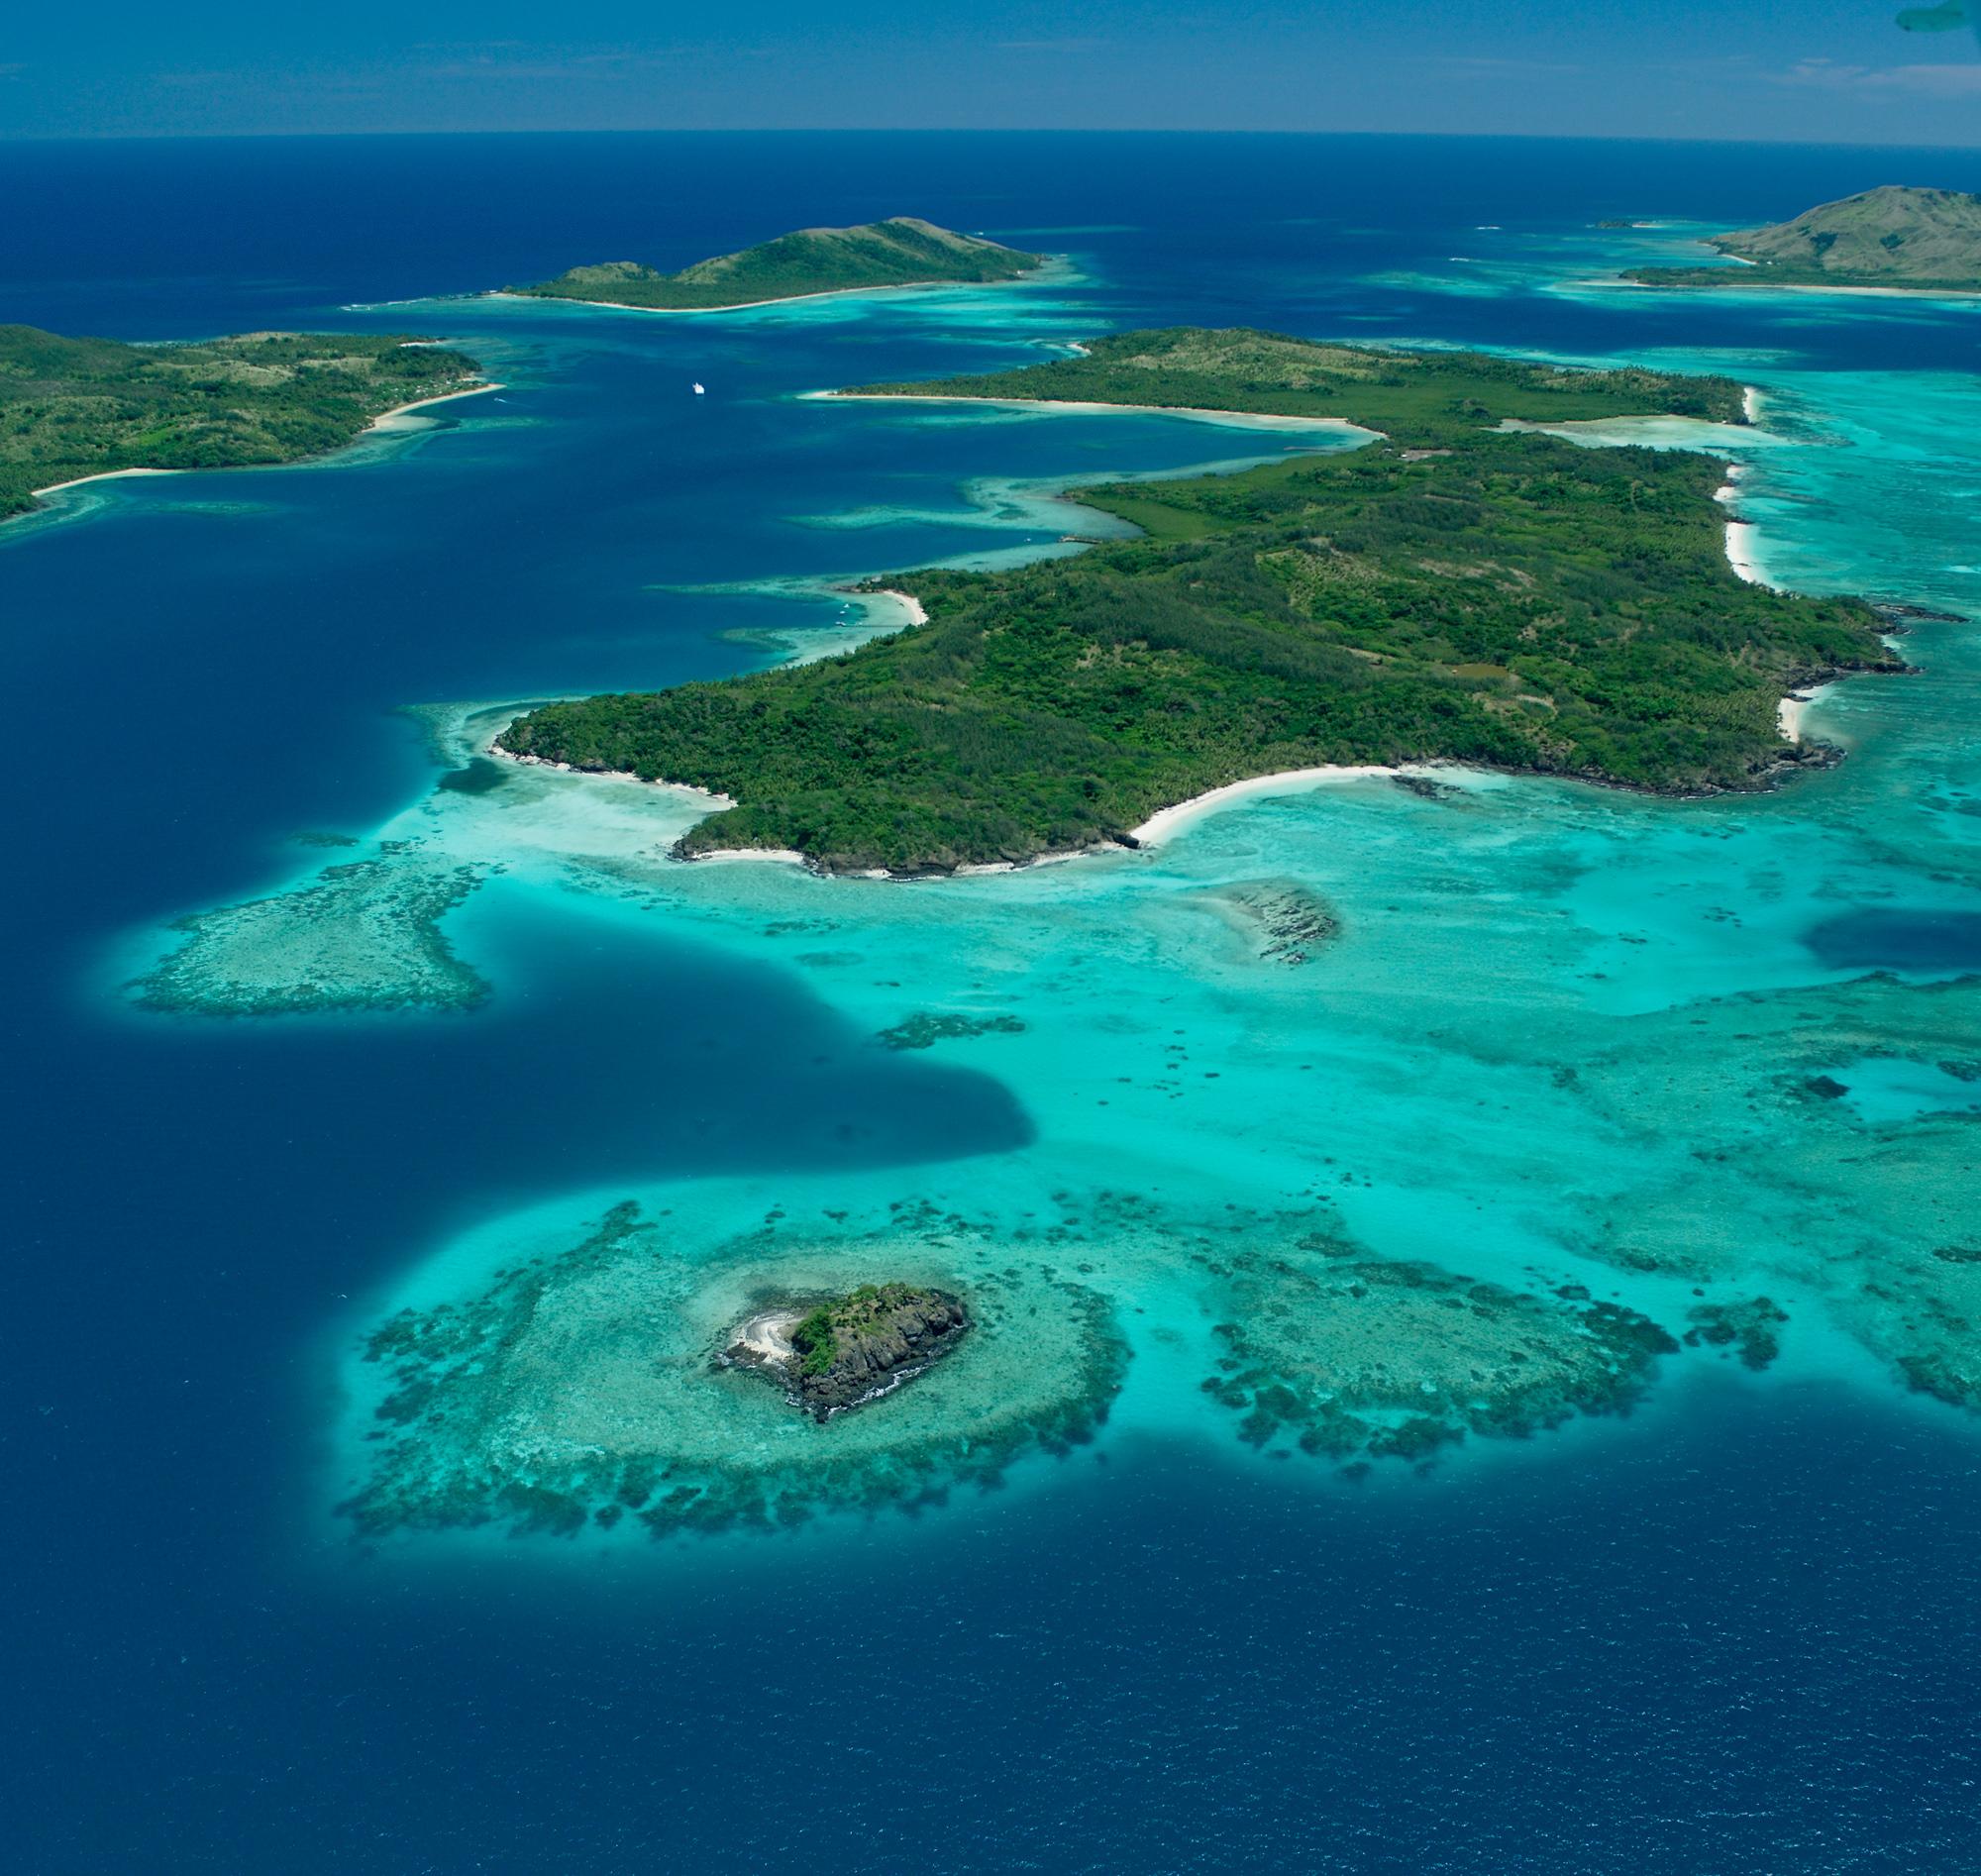 Fiji Seaplane Gallery